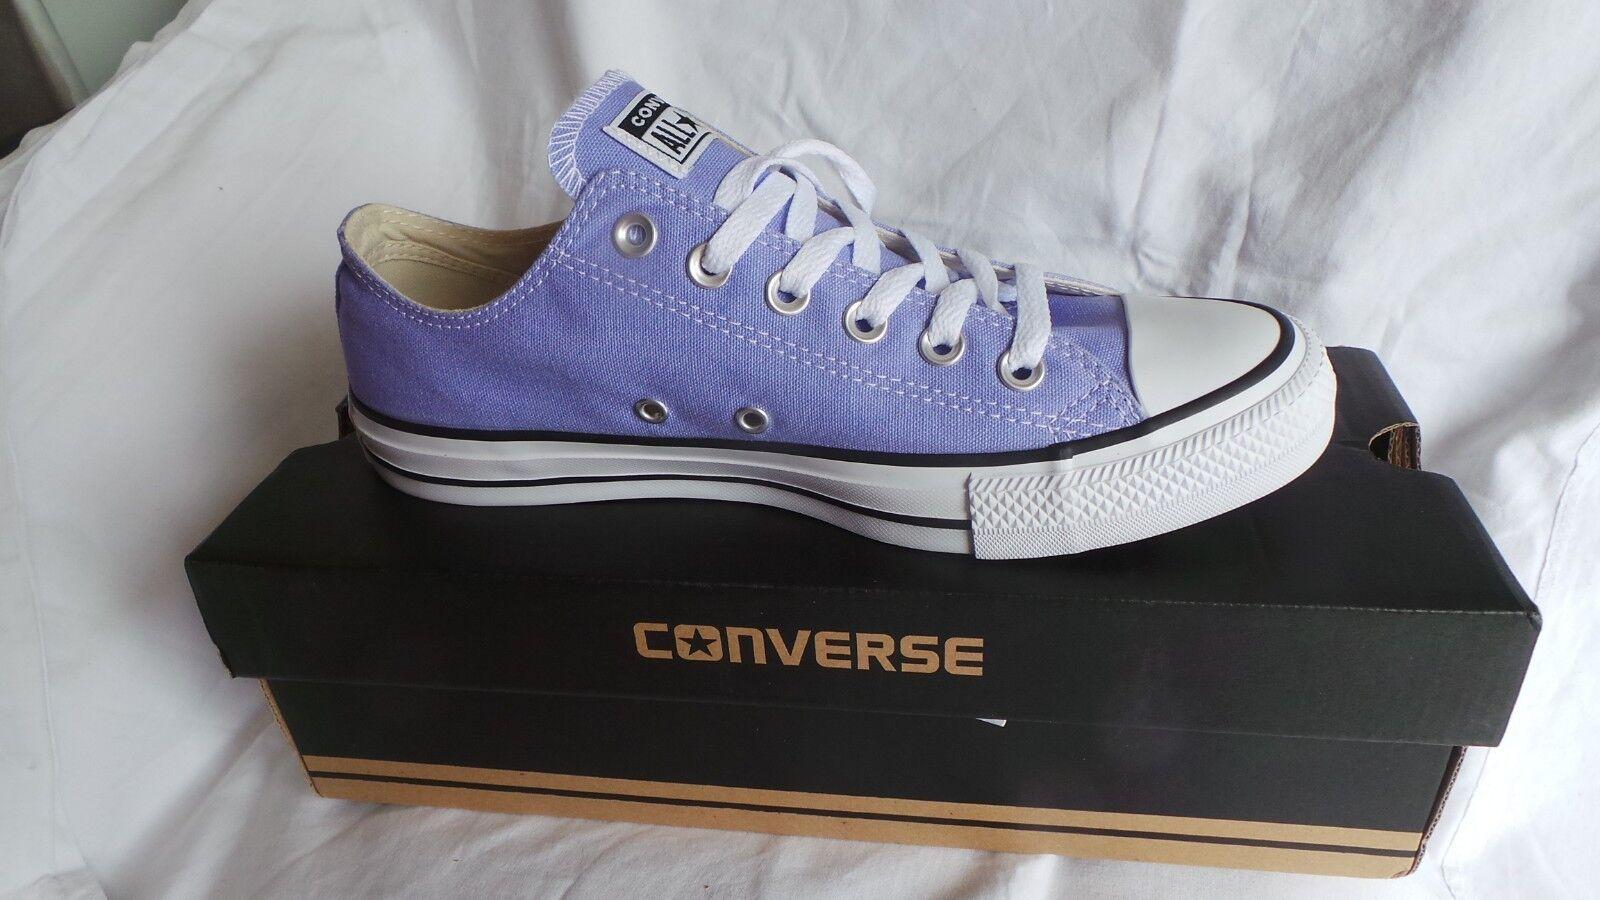 Brand NEW in box Converse Chuck Taylor Size All Star Ox Trainer Size Taylor 8 EU41.5 Lavende 0ddec4